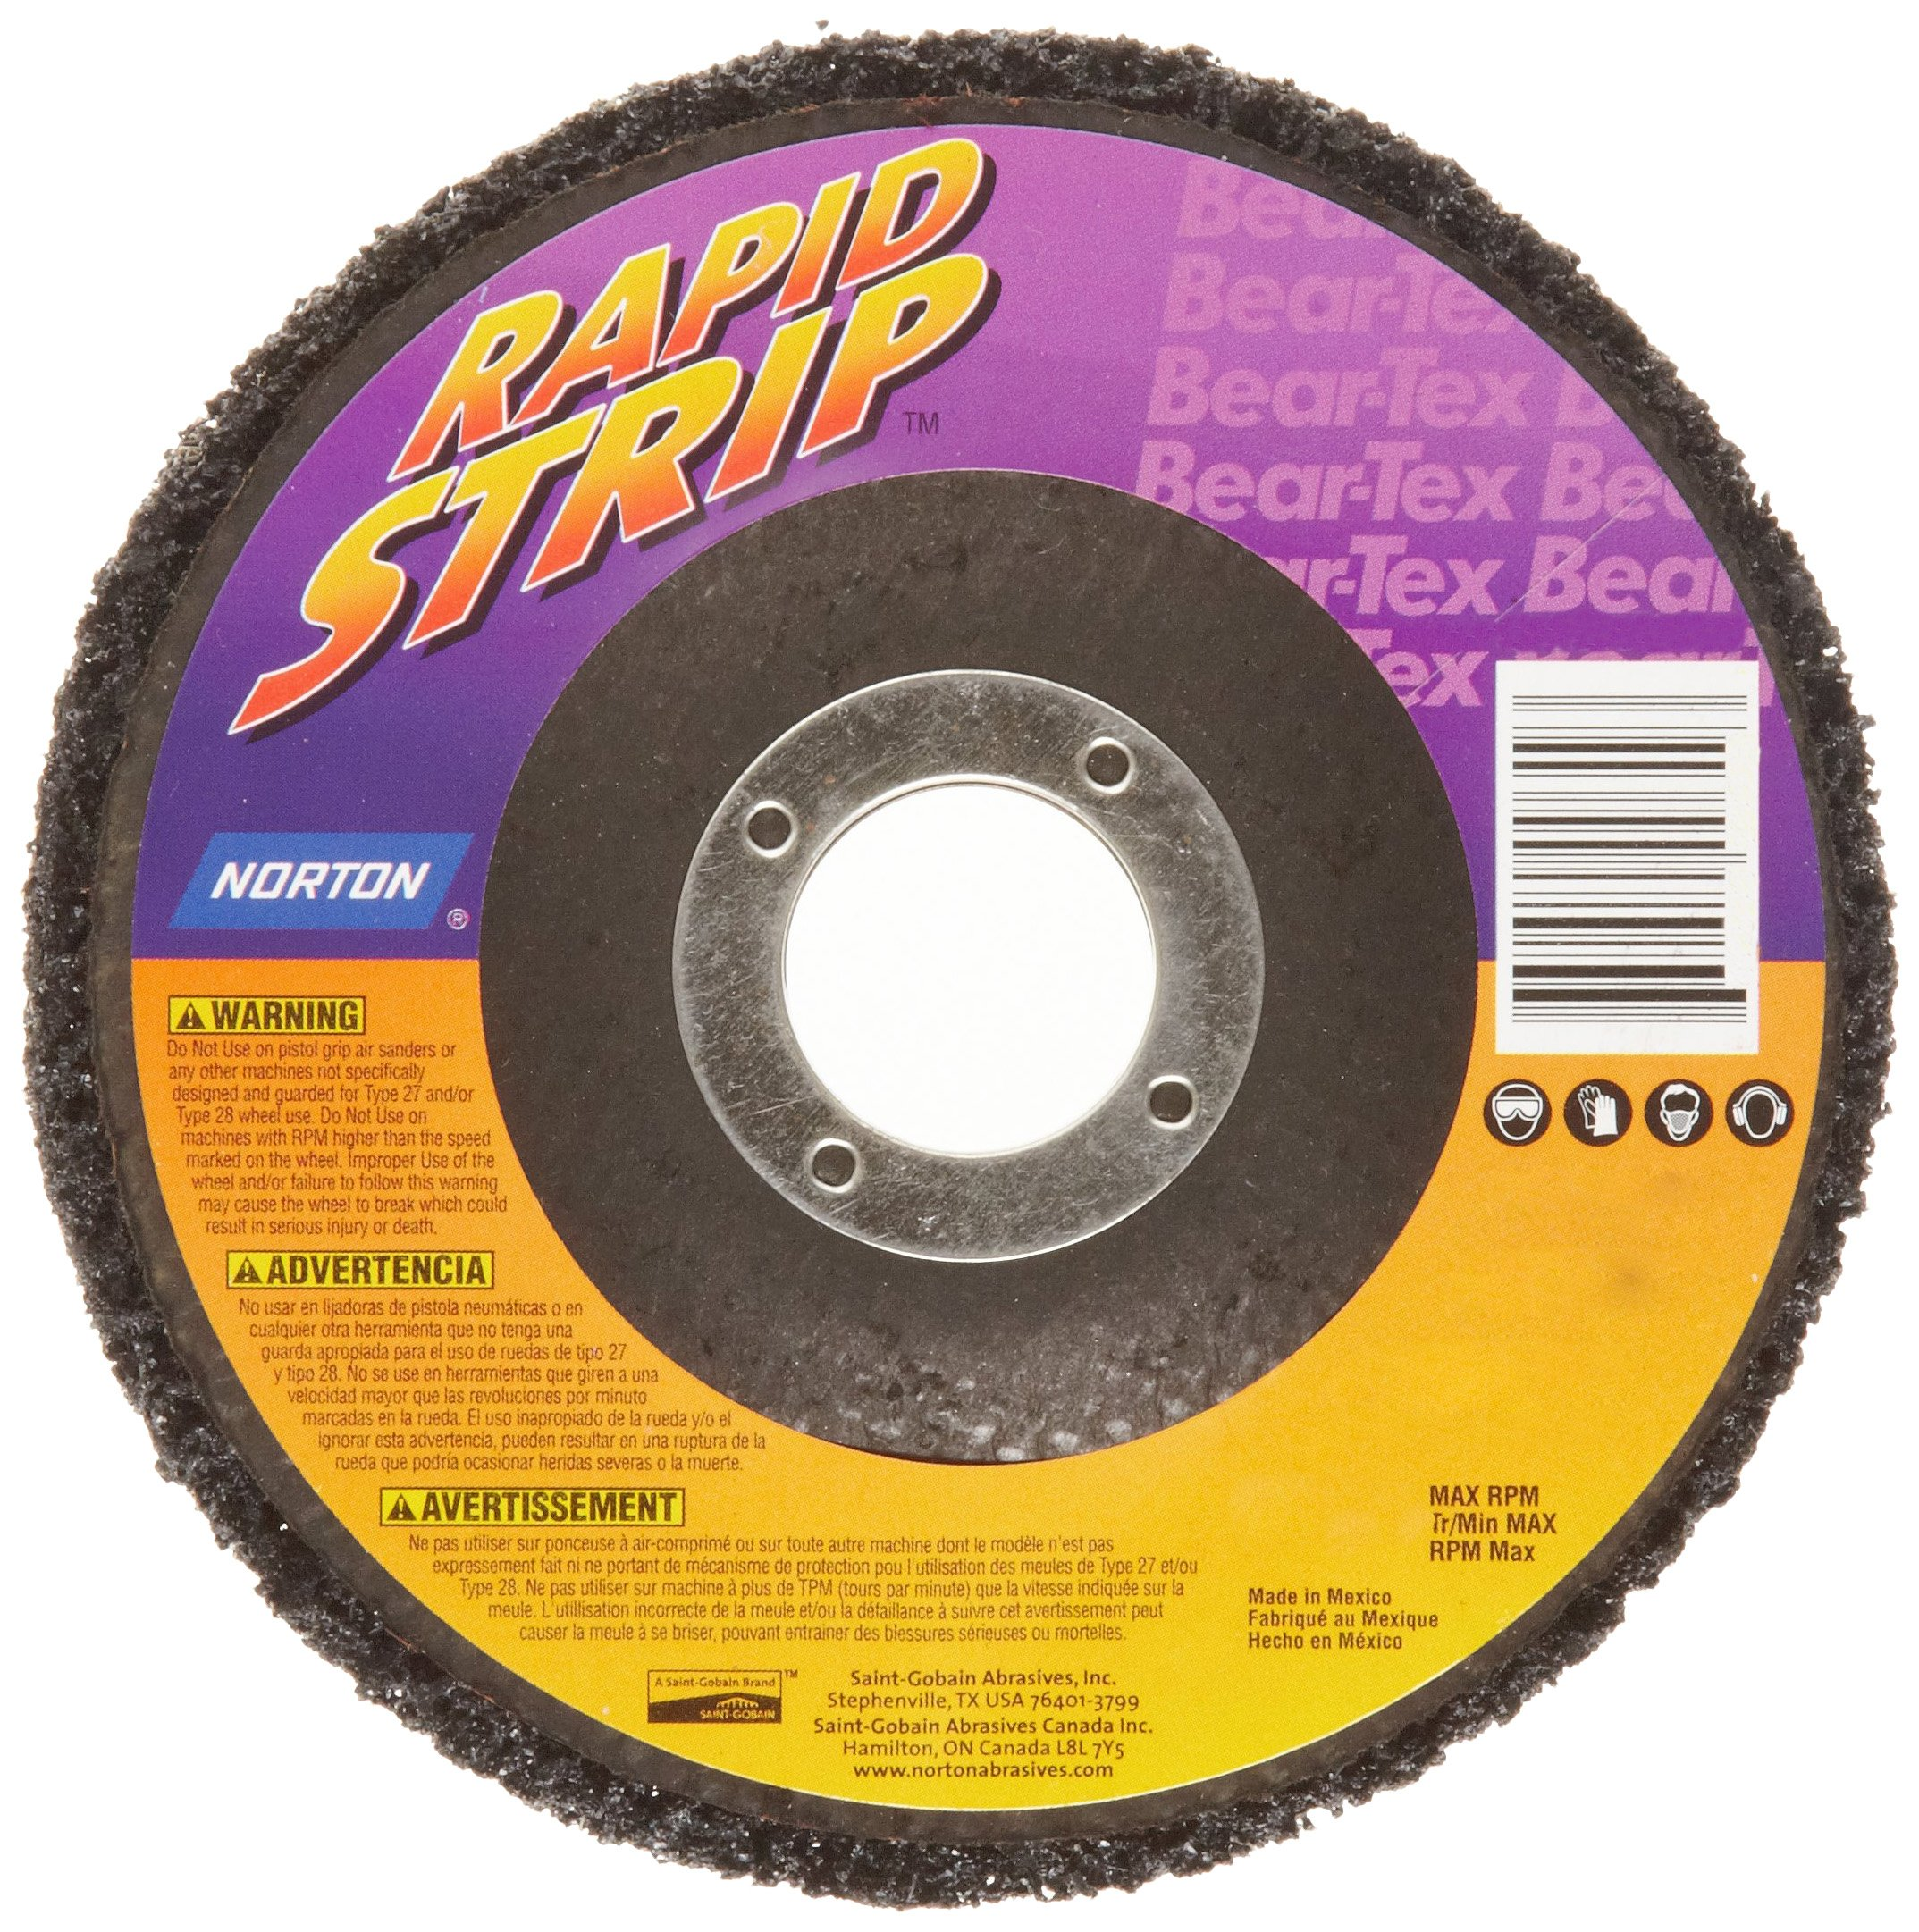 Norton Bear-Tex Rapid Strip Depressed Center Nonwoven Abrasive Wheel, Type 27, Fiber Backing, 7/8'' Arbor, Silicon Carbide, 4-1/2'' Diameter, Grit Extra Coarse (Pack of 10)